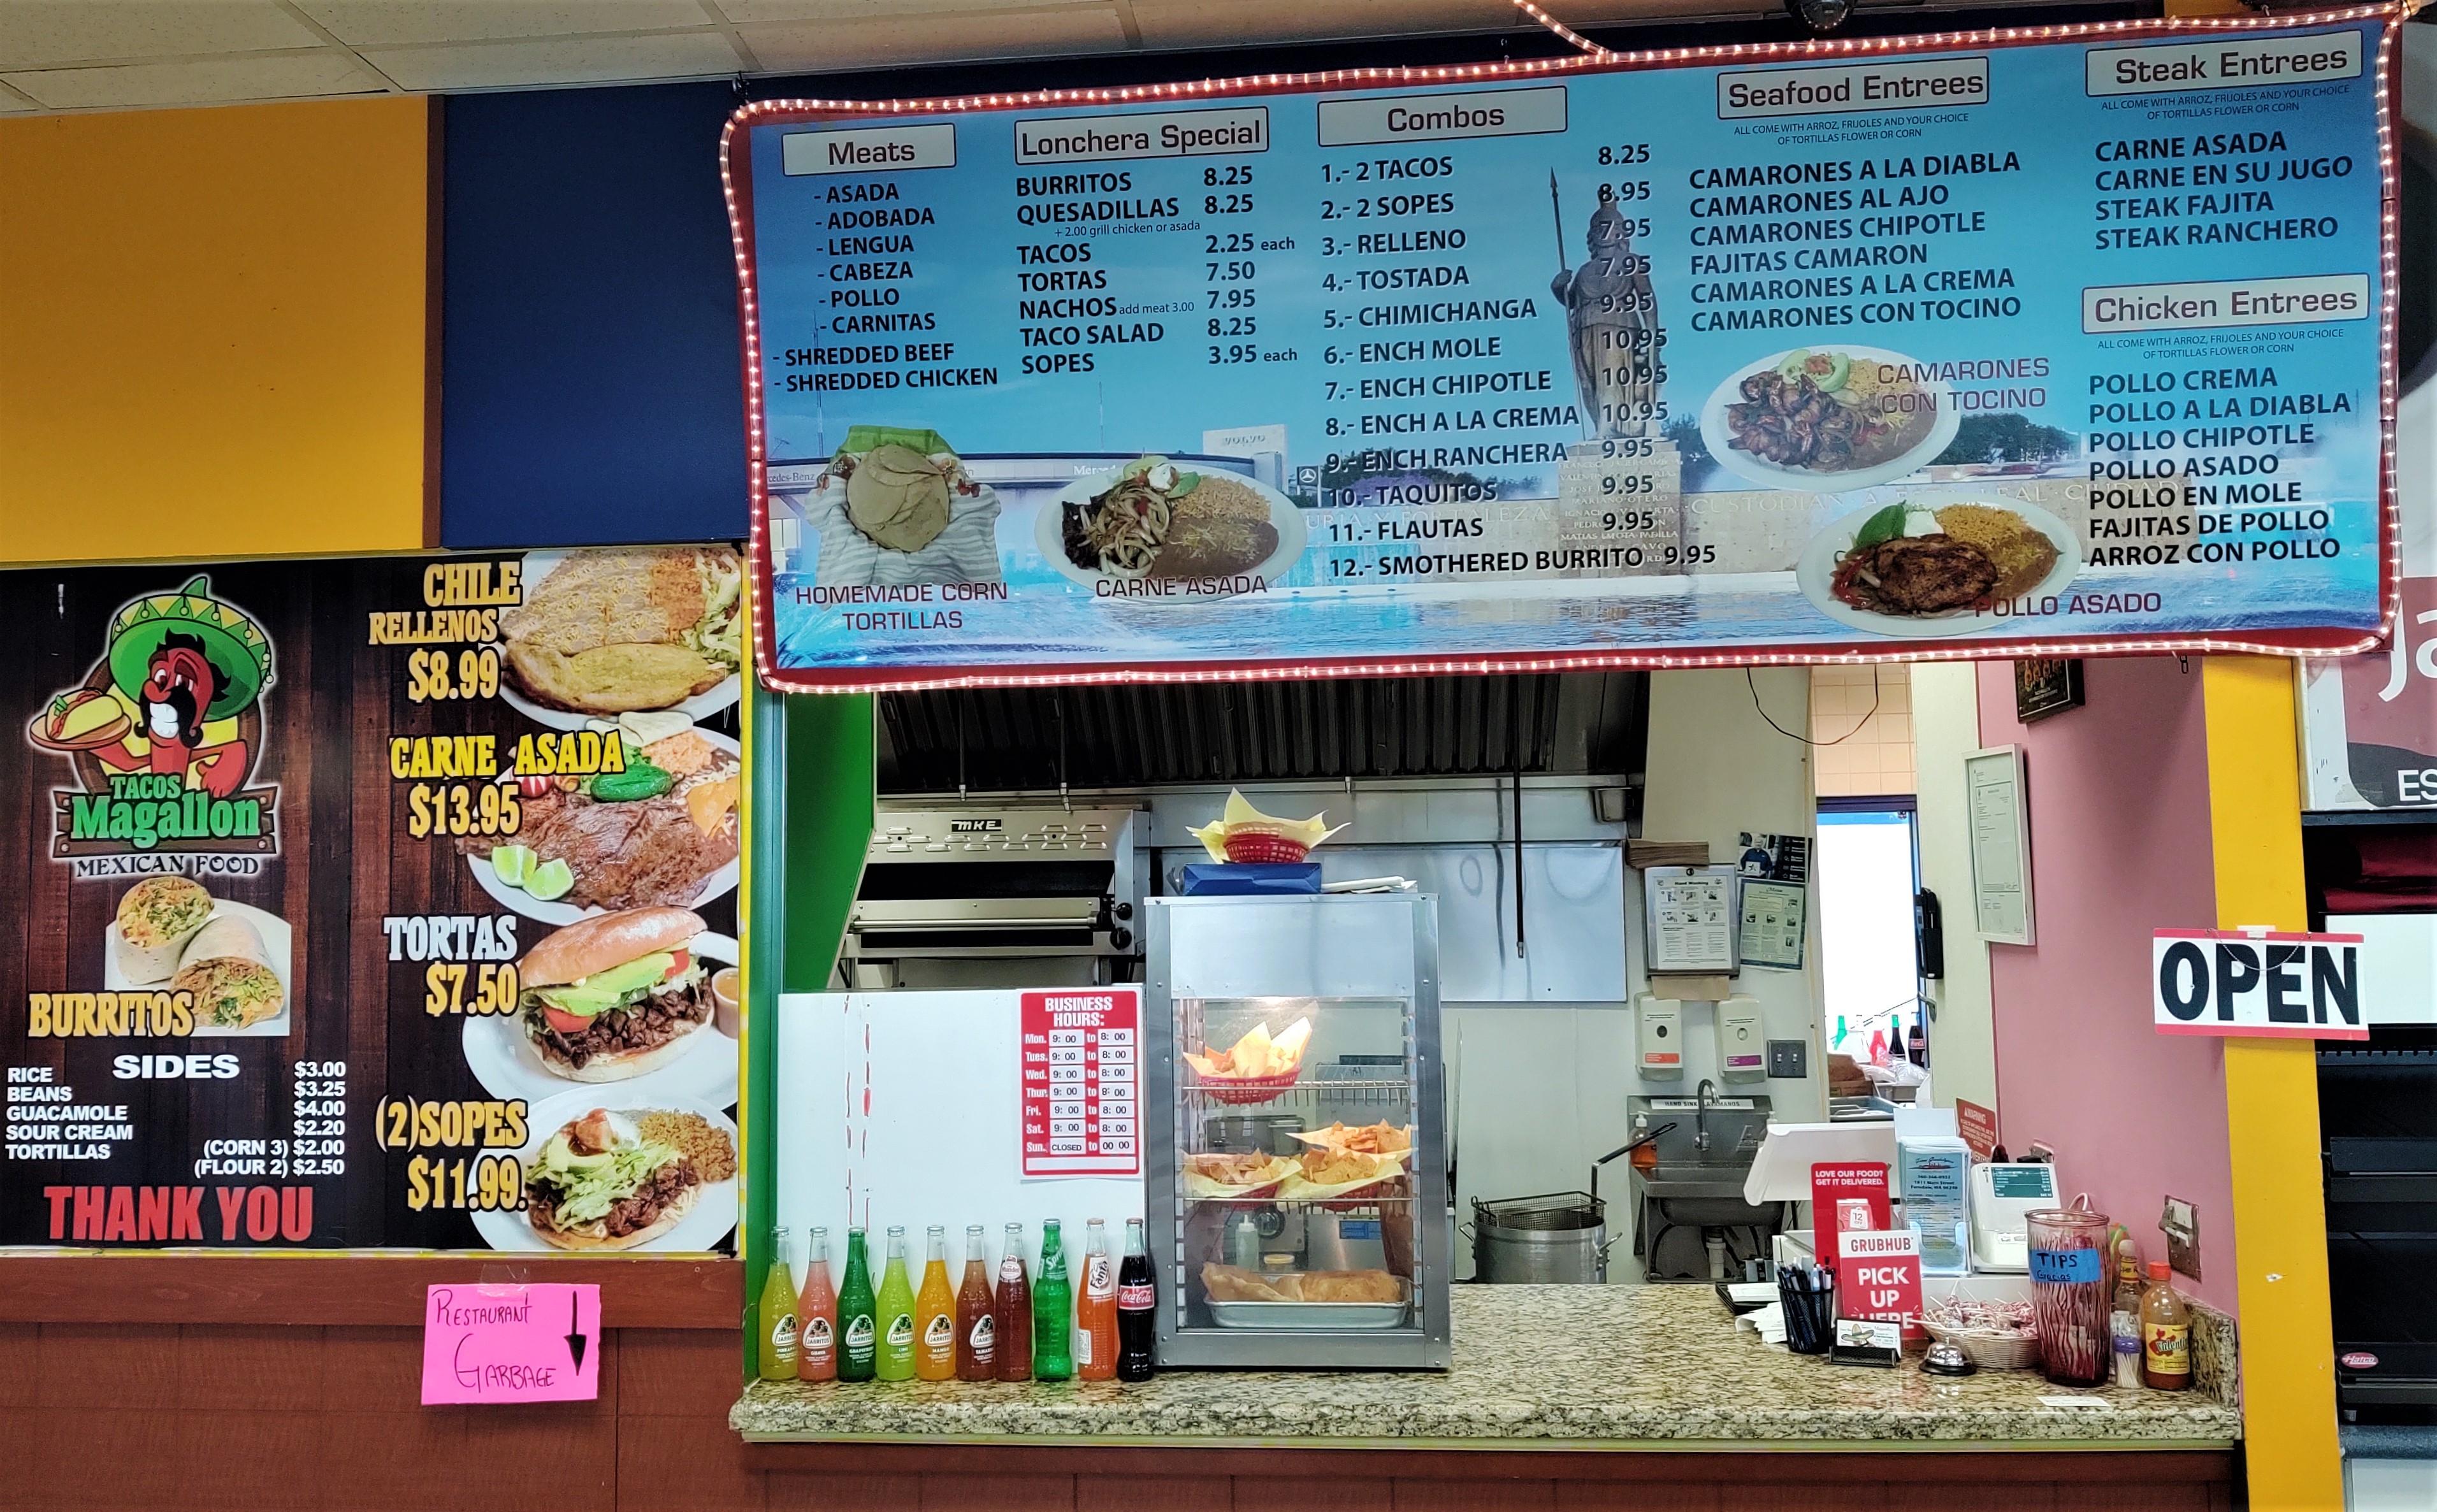 Service counter and menu Board inside Tacos Guadalajara (January 20, 2020). Photo: My Ferndale News